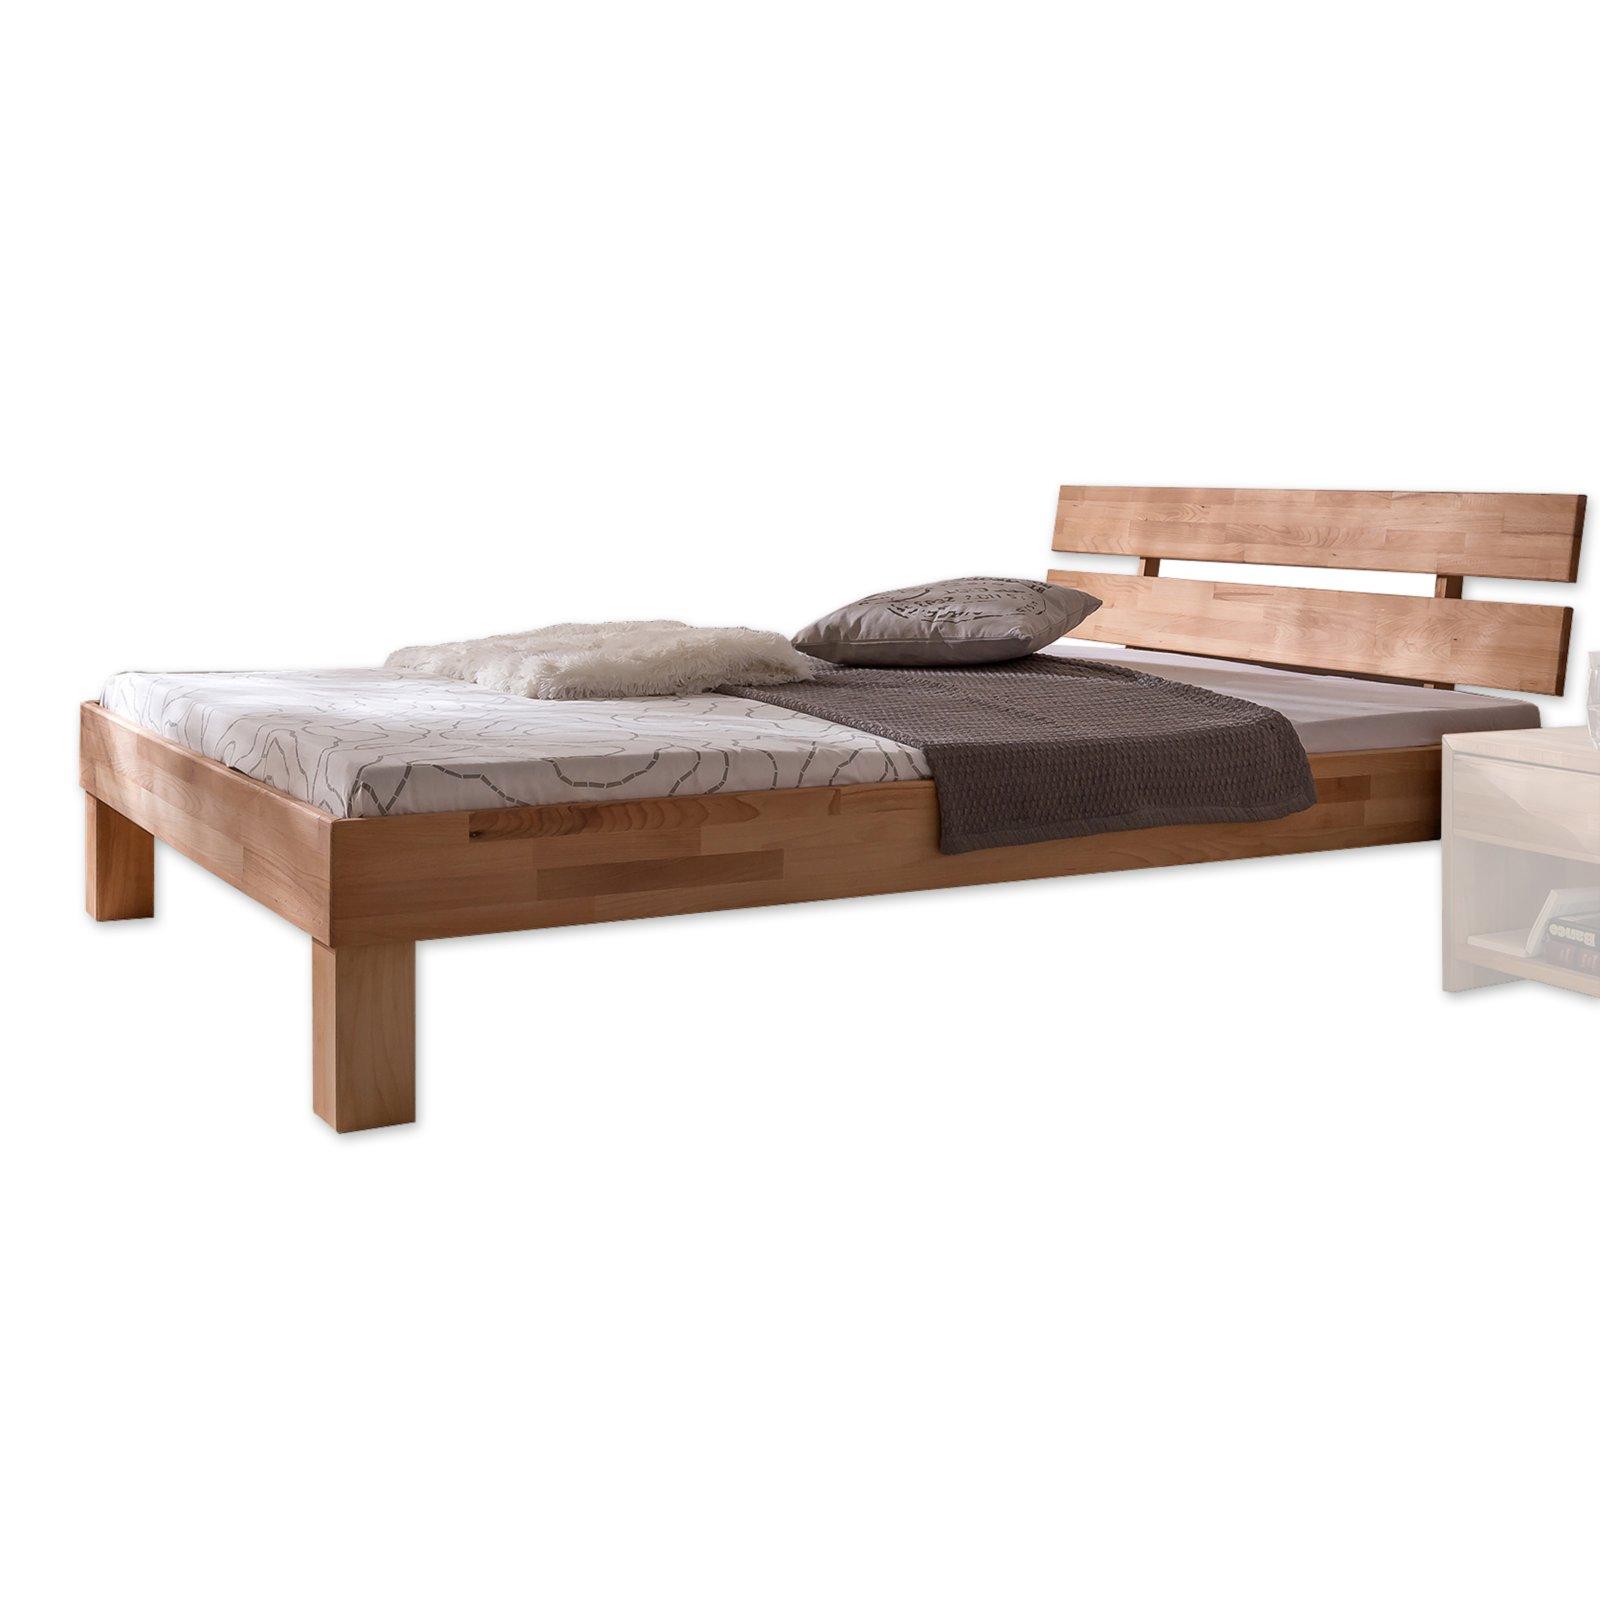 betten 140x200 massiv m bel inspiration und innenraum ideen. Black Bedroom Furniture Sets. Home Design Ideas